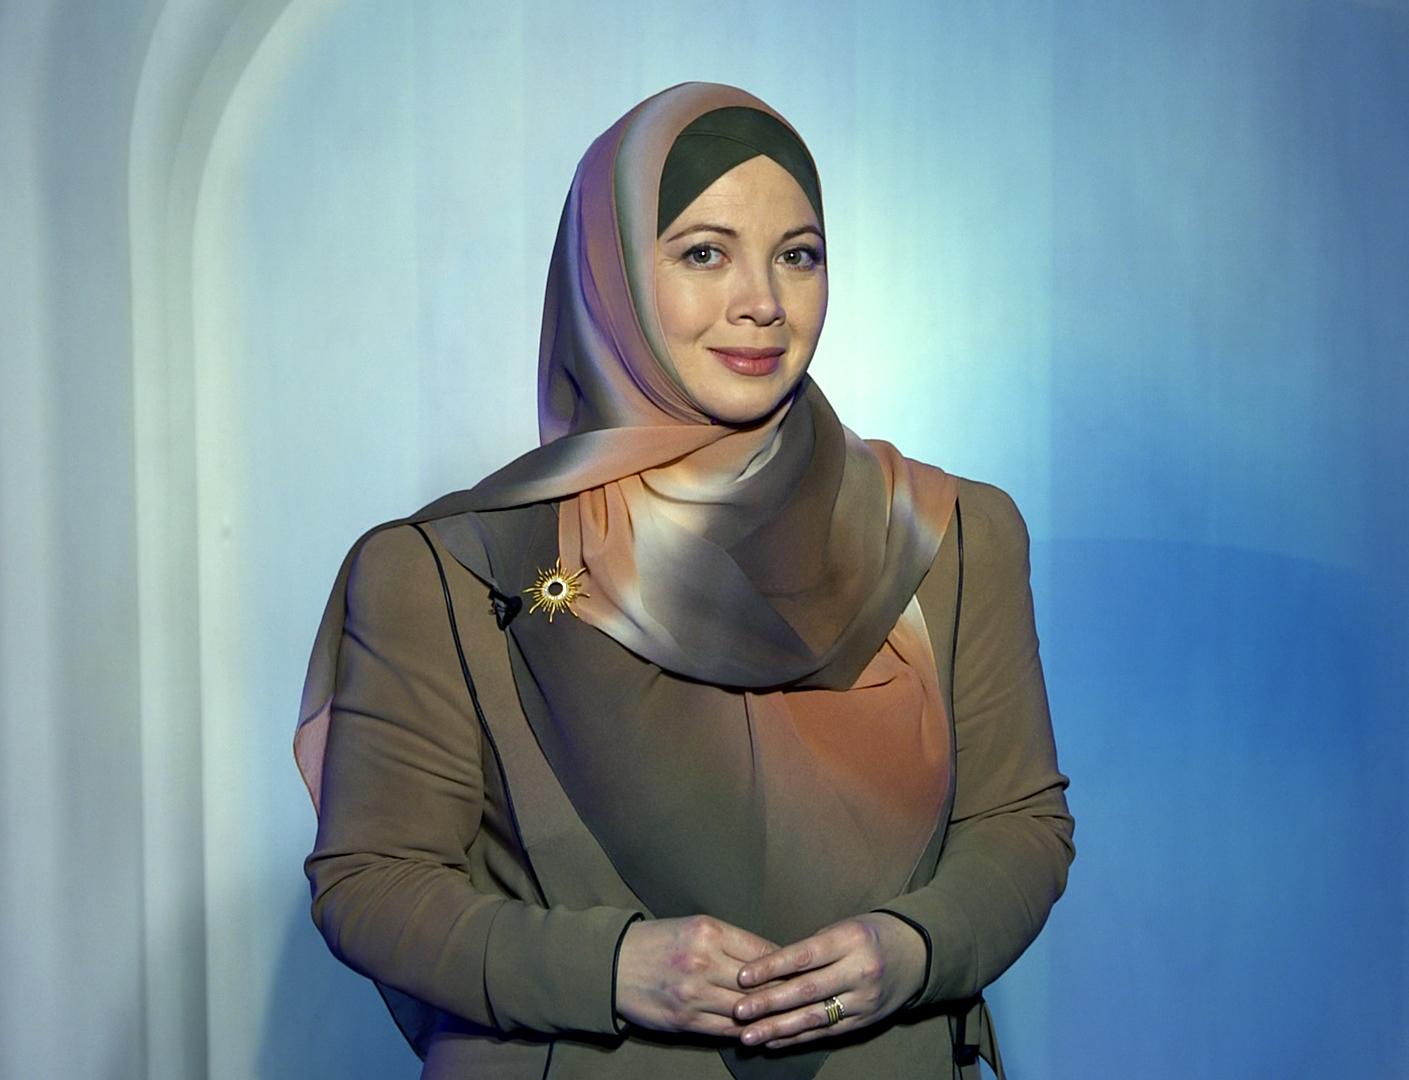 Секс исламских женщин